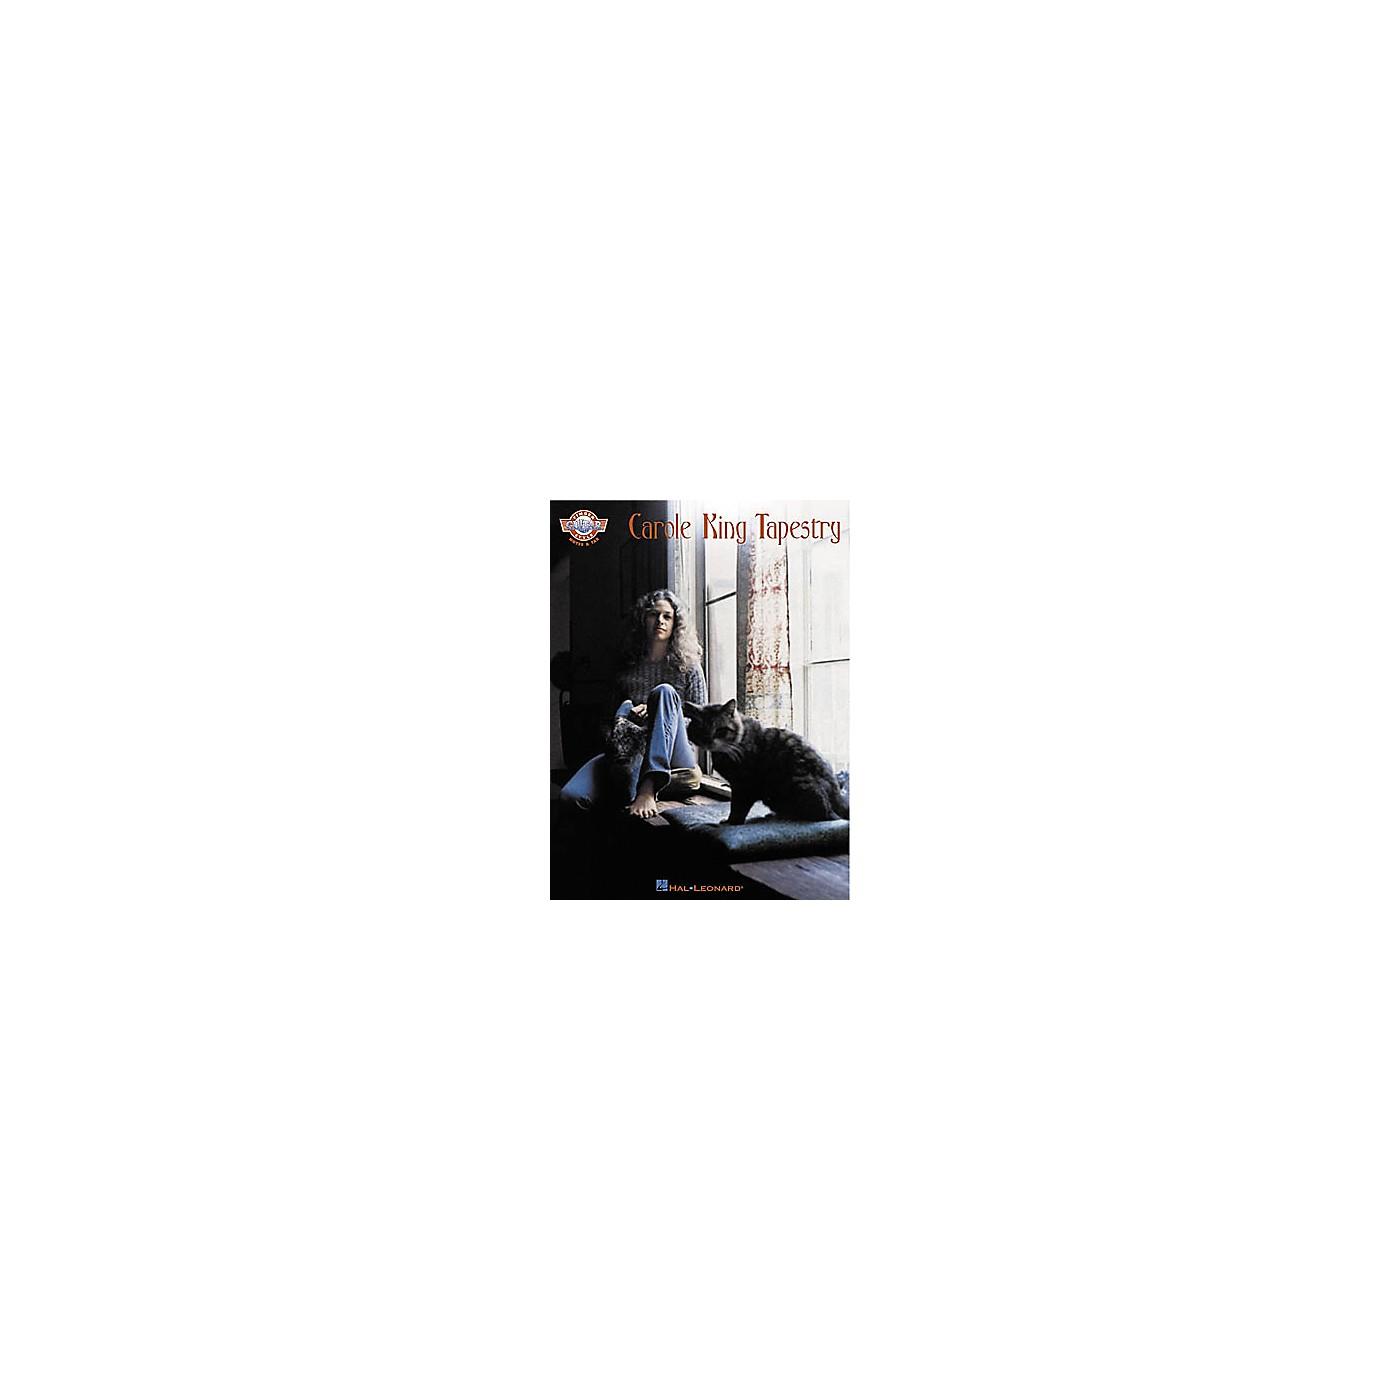 Hal Leonard Carole King - Tapestry Guitar Tab Songbook thumbnail